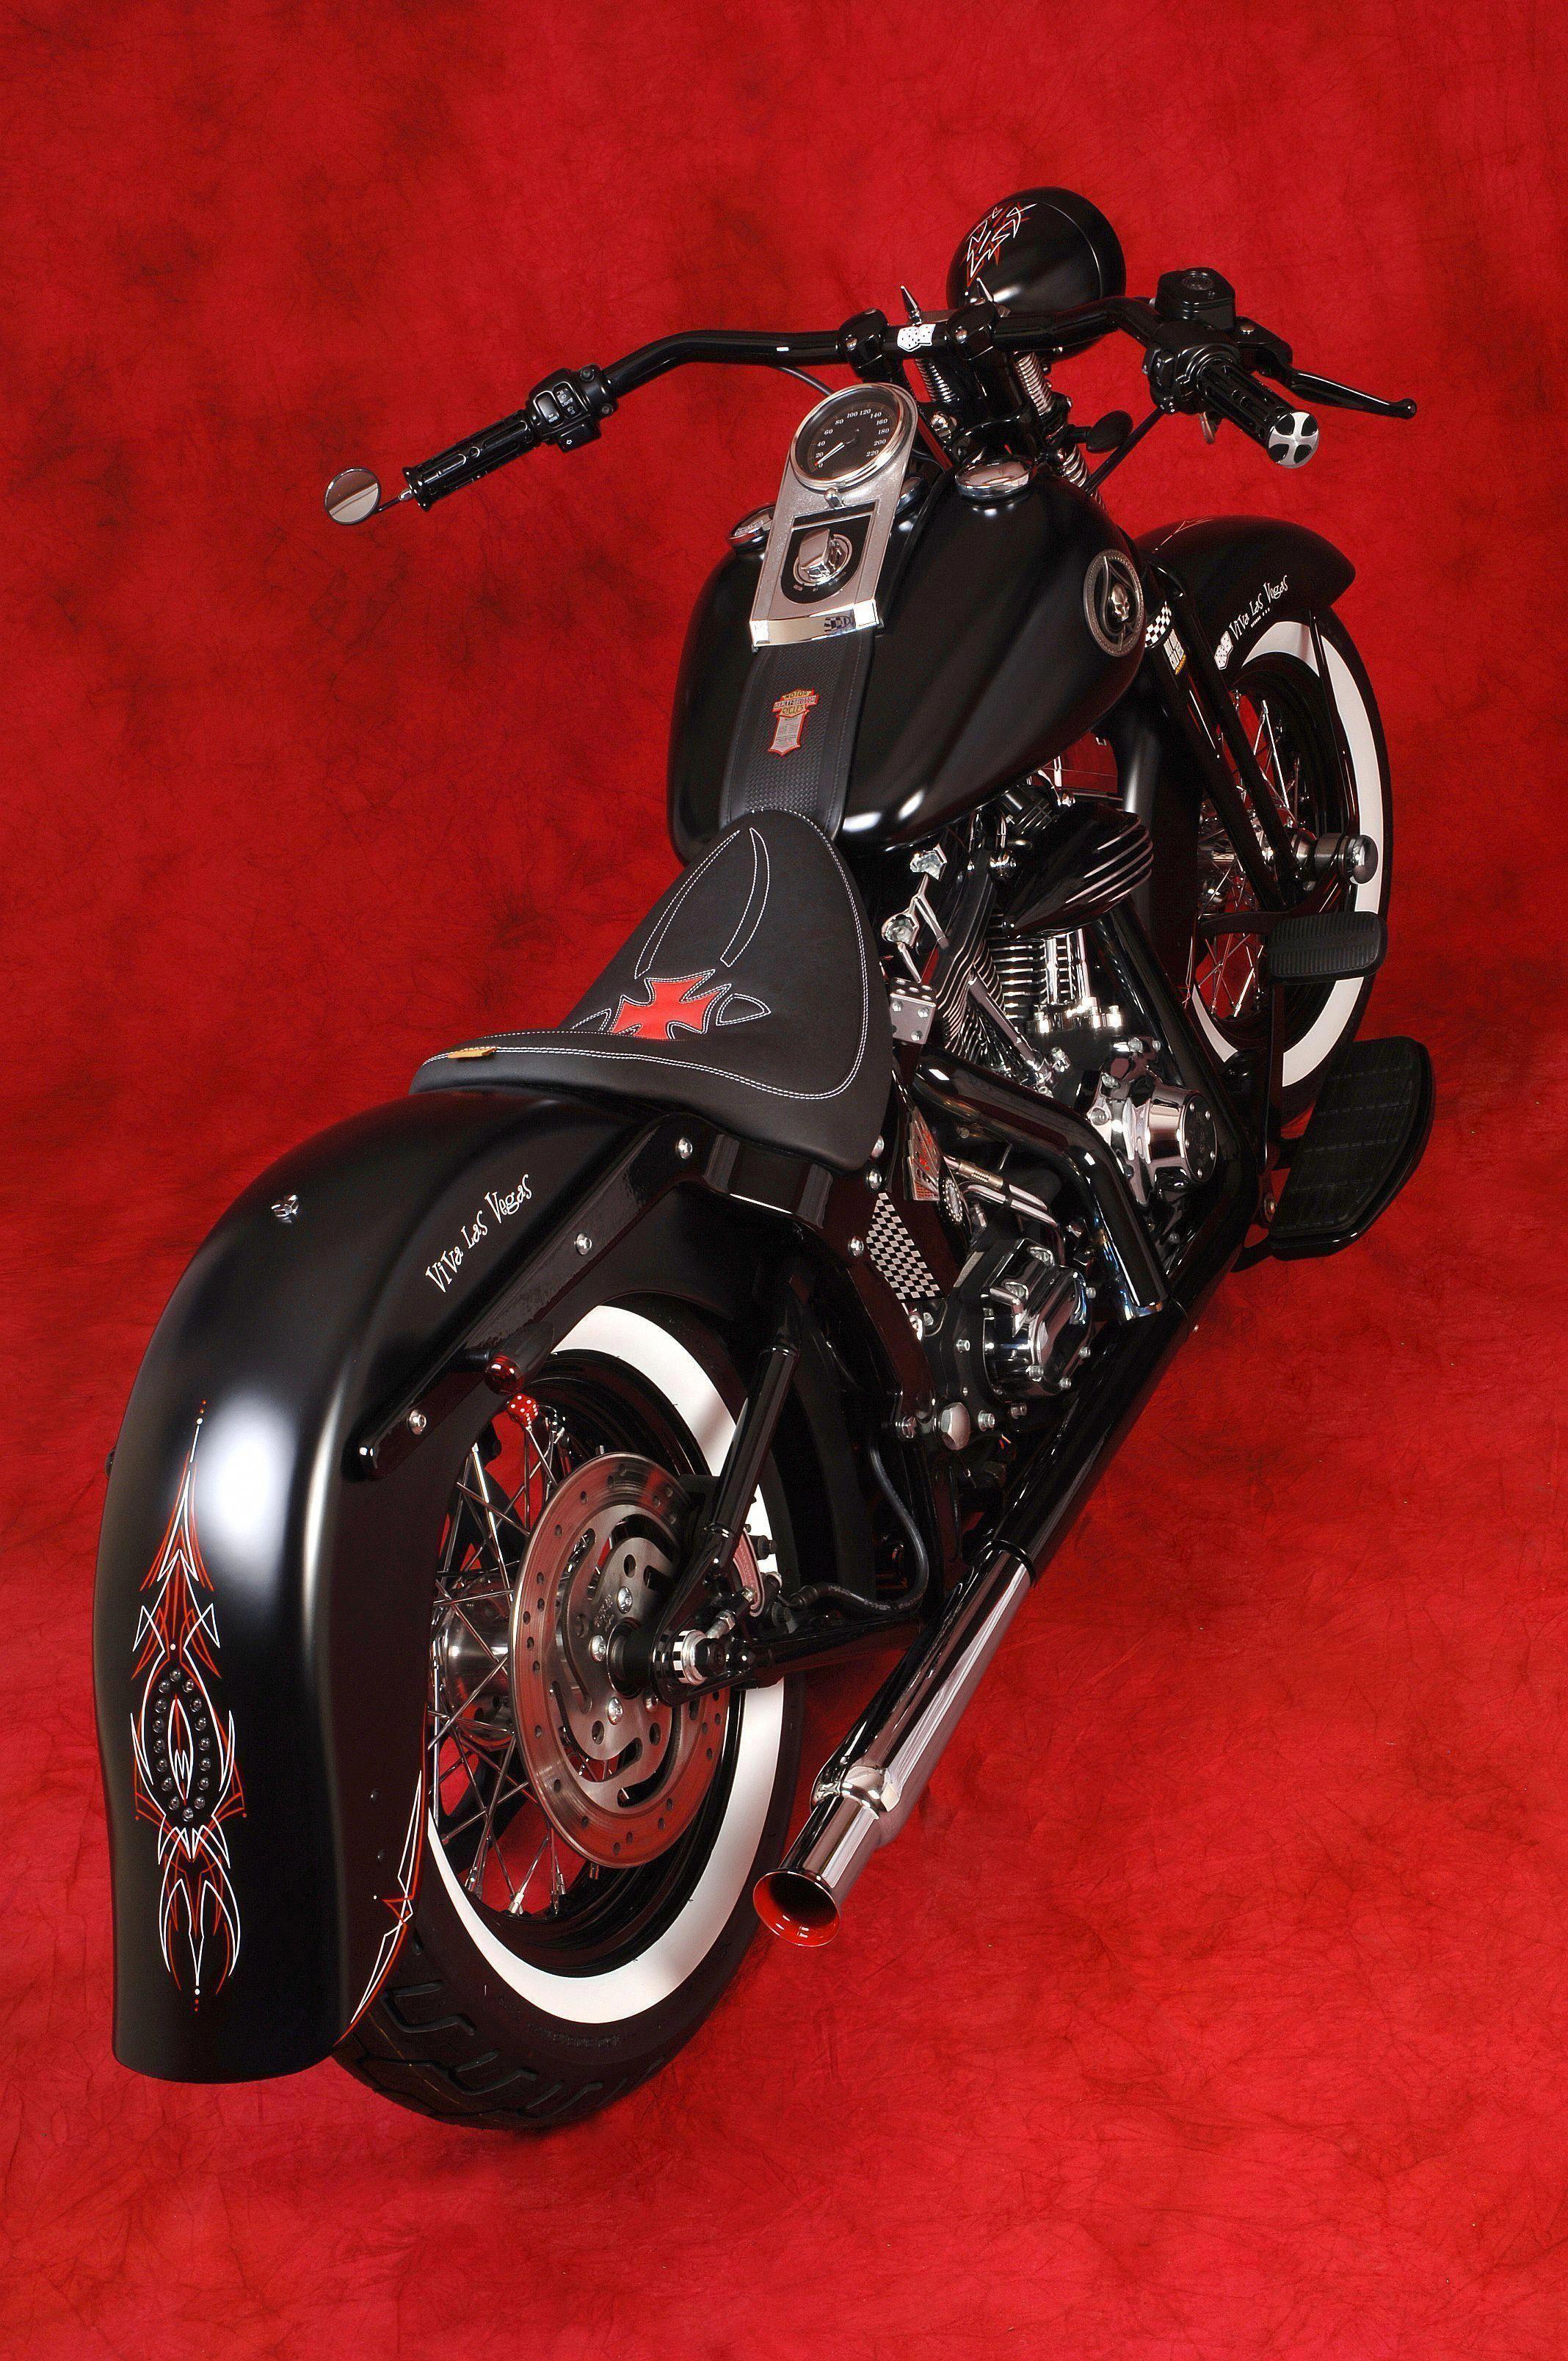 7 Awesome Ideas Harley Davidson Art Freedom Harley Davidson Wallpaper Blue Vintage Harley Davidson Art Harley Davidso Harley Davidson Voitures Et Motos Harley